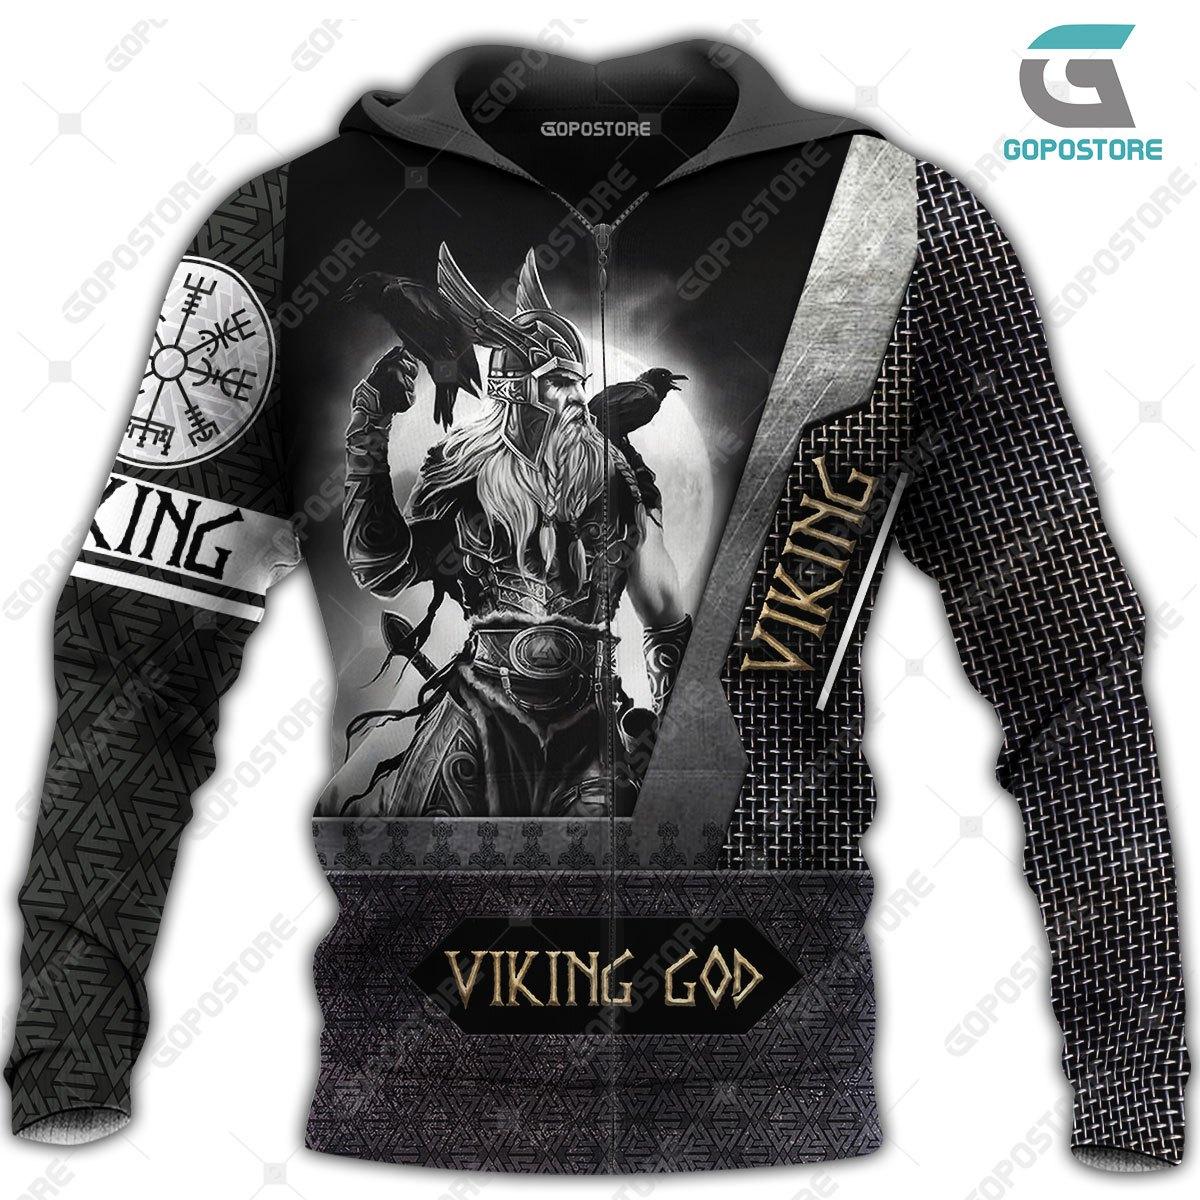 Viking god viking warrior full printing zip hoodie